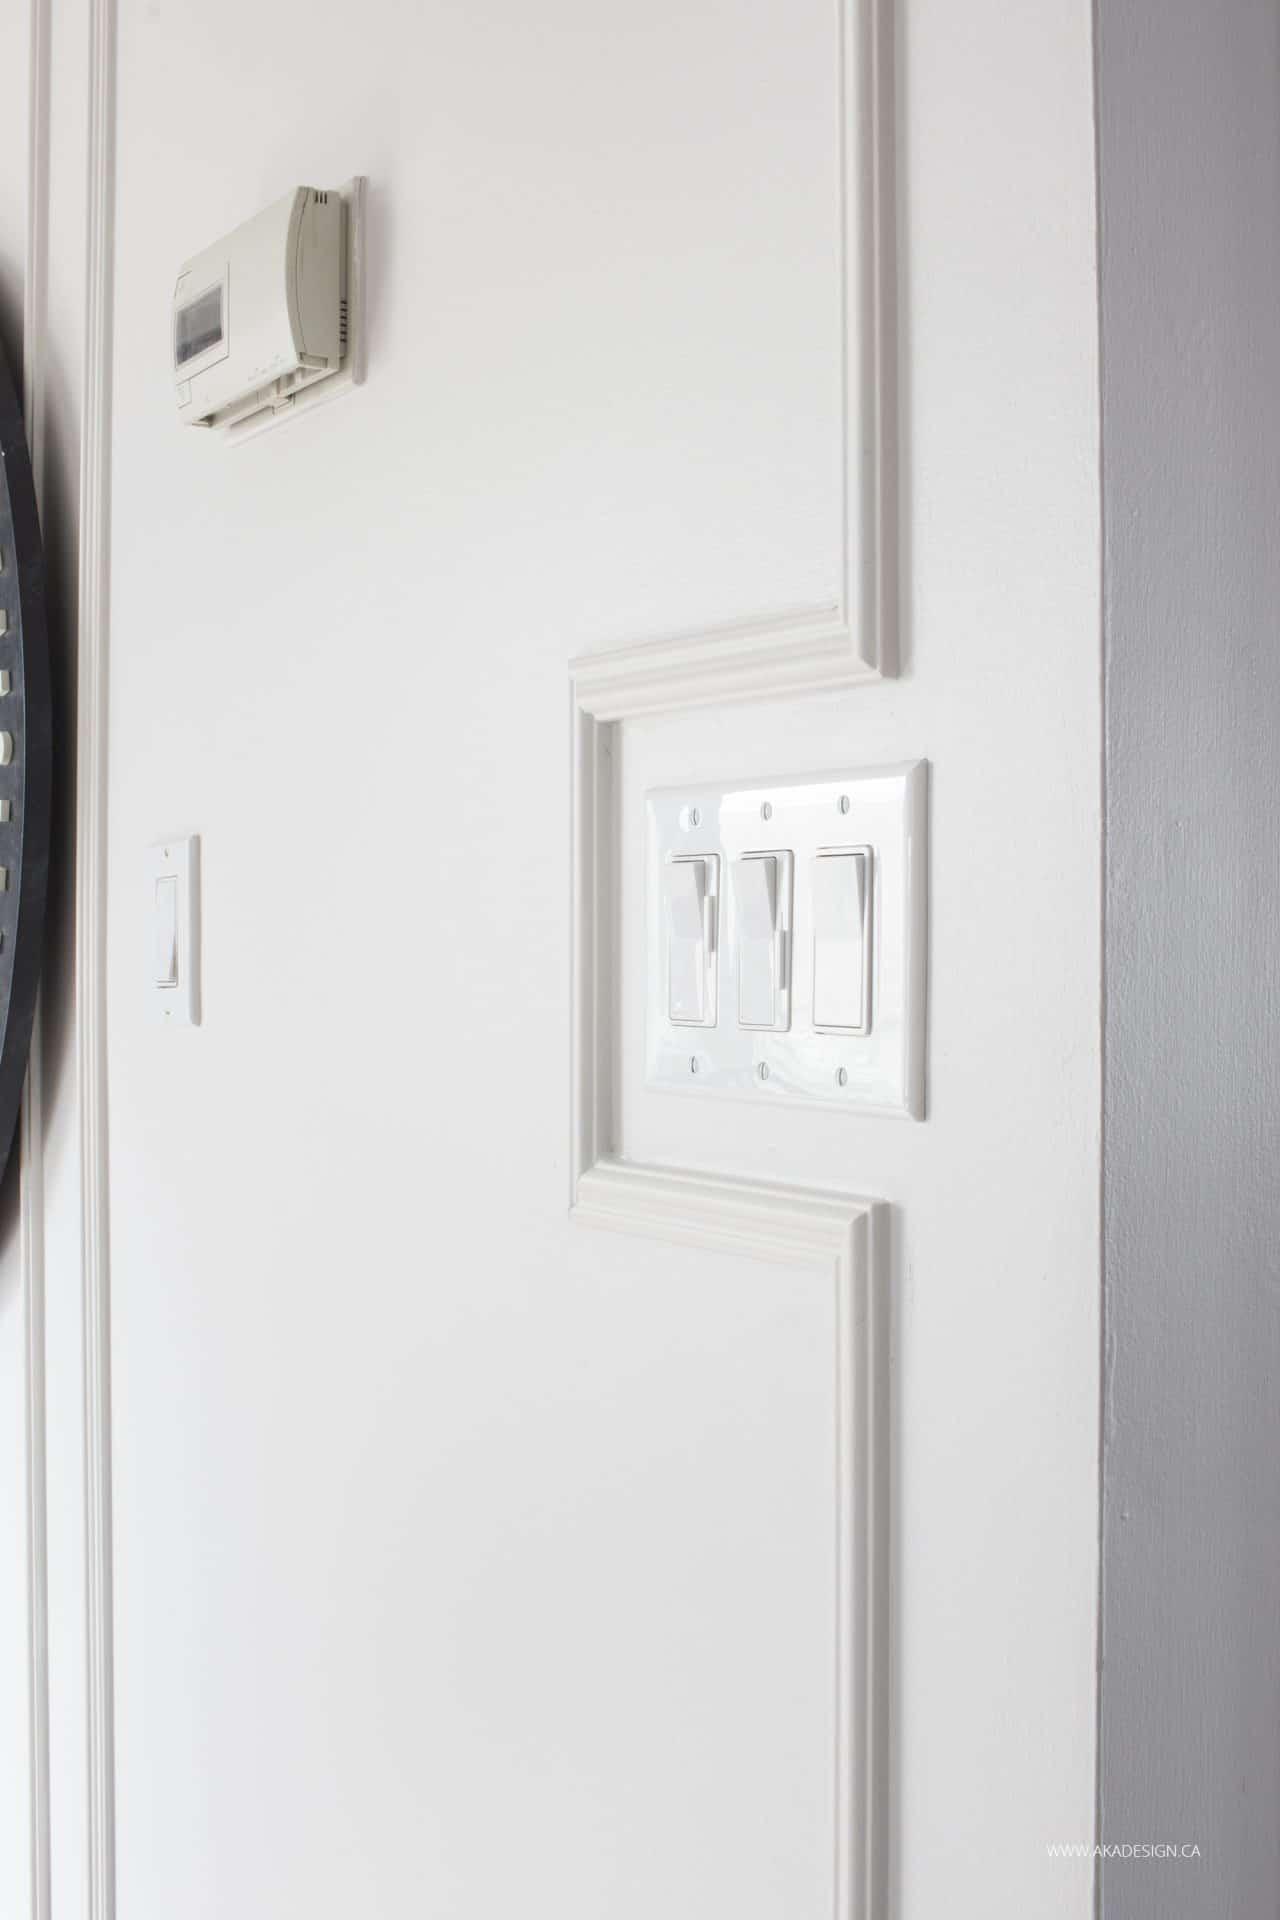 trim detail around light switch